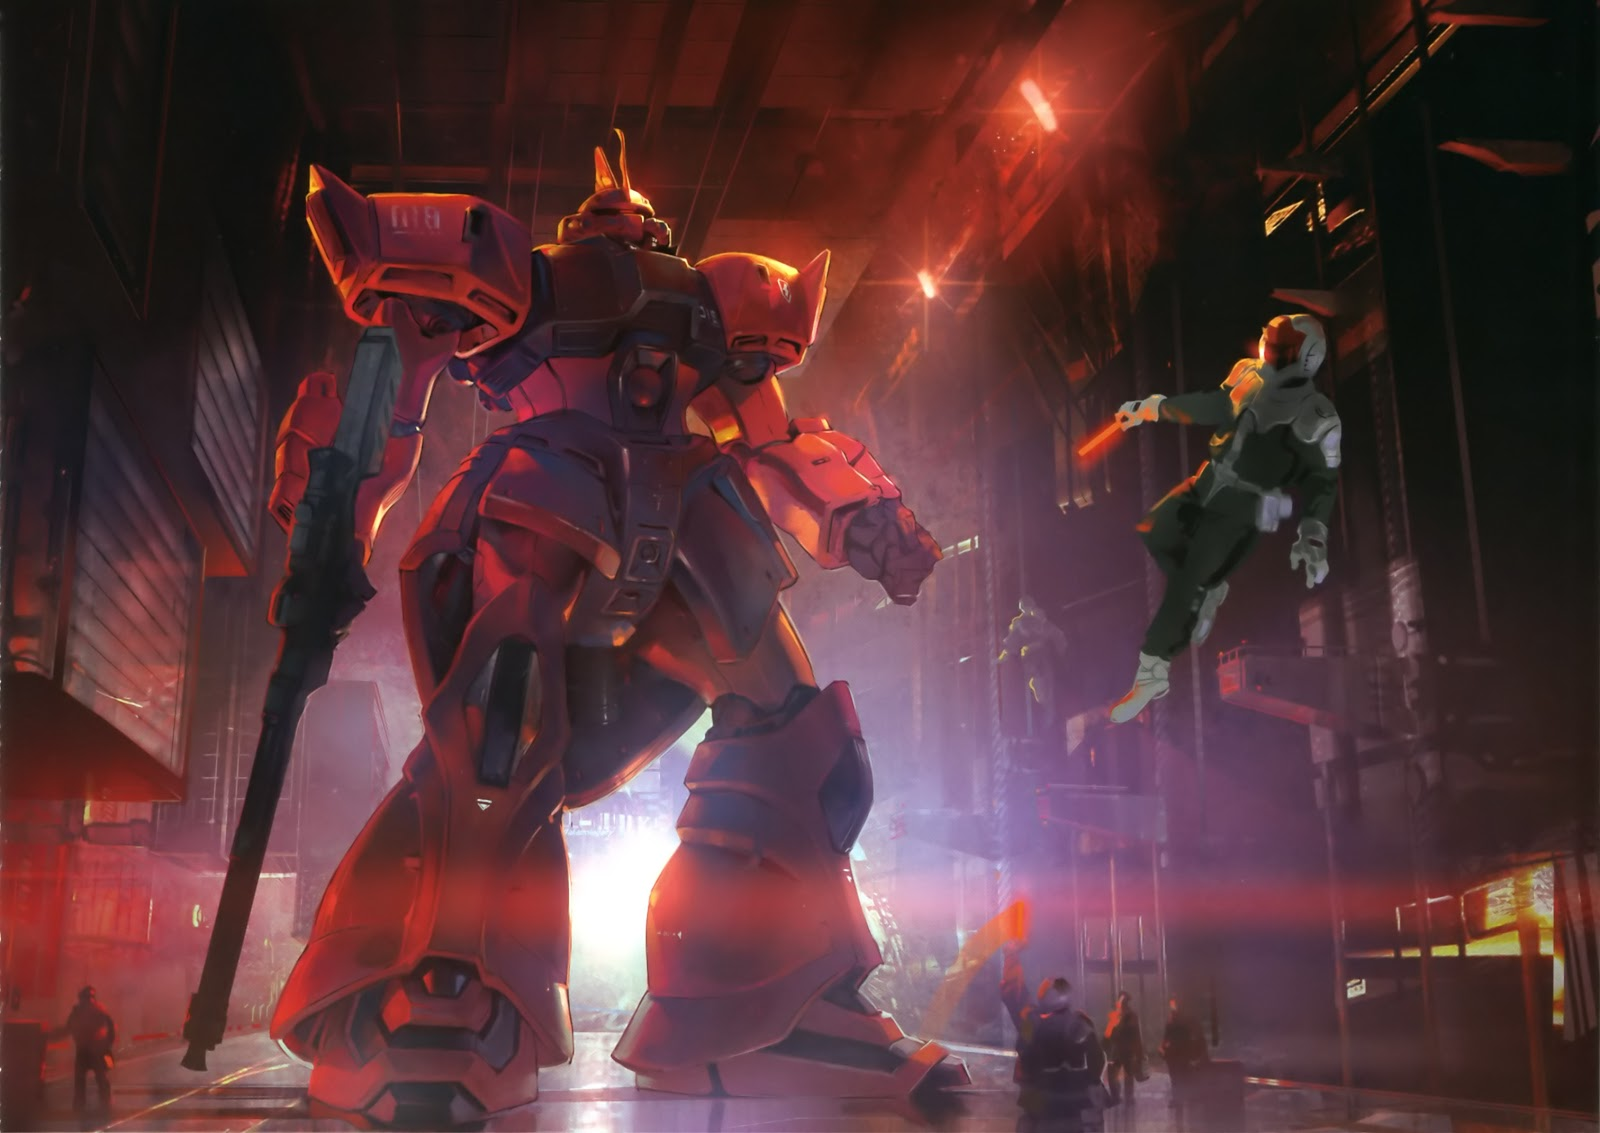 Gundam Walls and LOLS MS 14Jg Gelgoog Jger Wallpaper 1600x1133